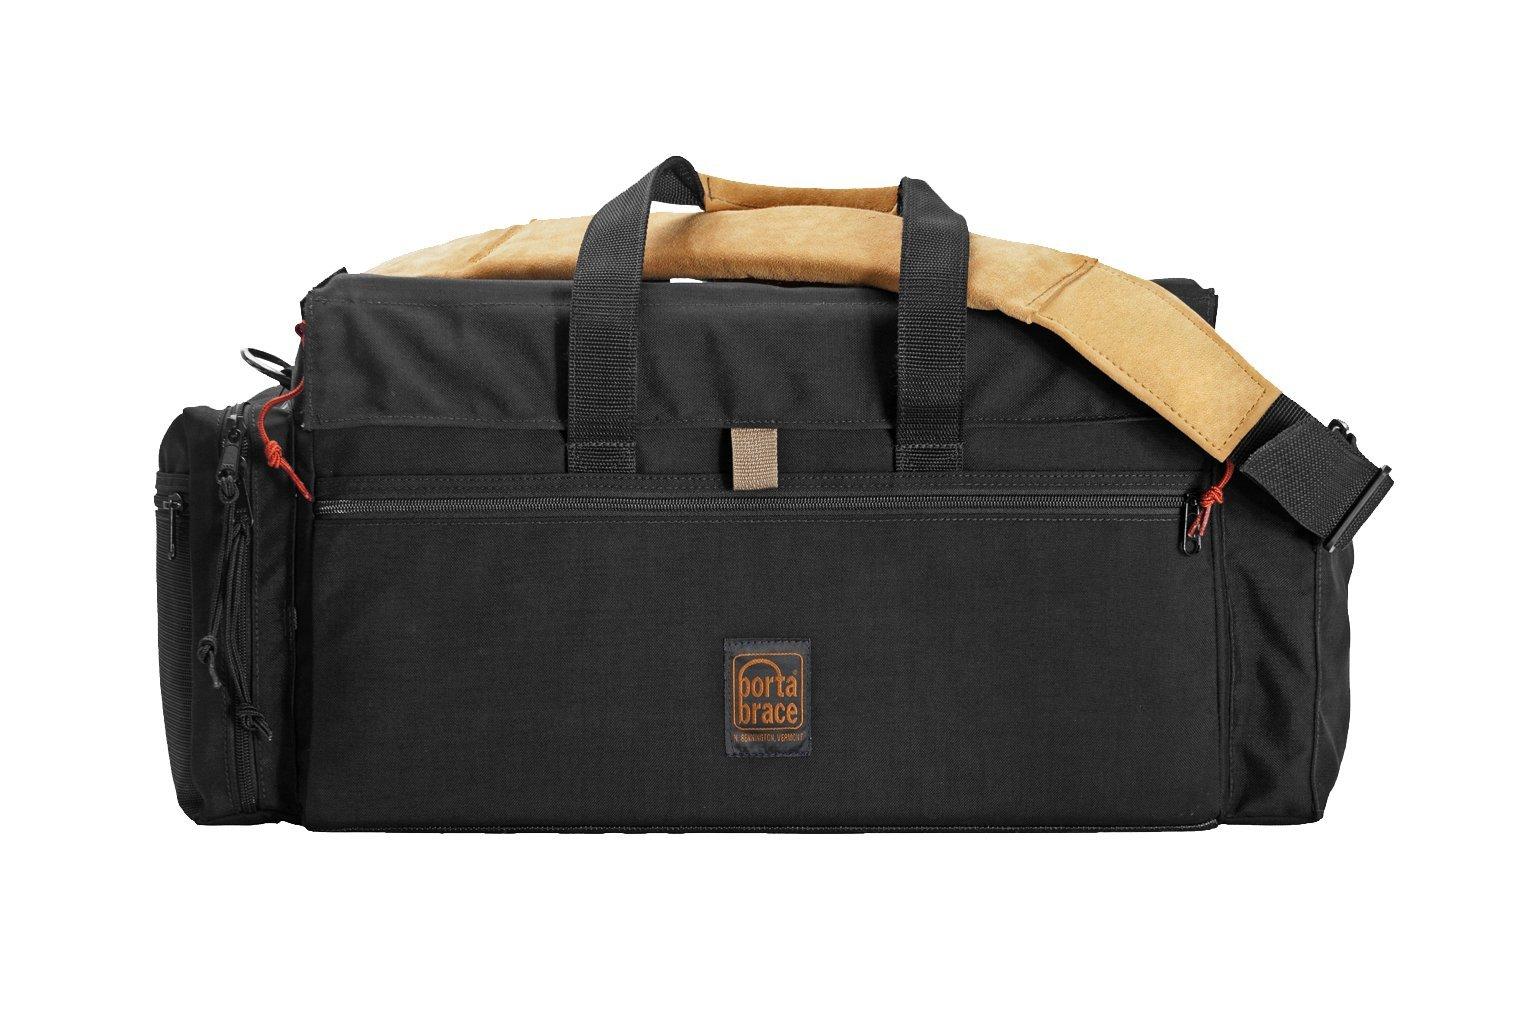 PortaBrace DCO-3R Large DSLR Camera Organizer Bag - Black